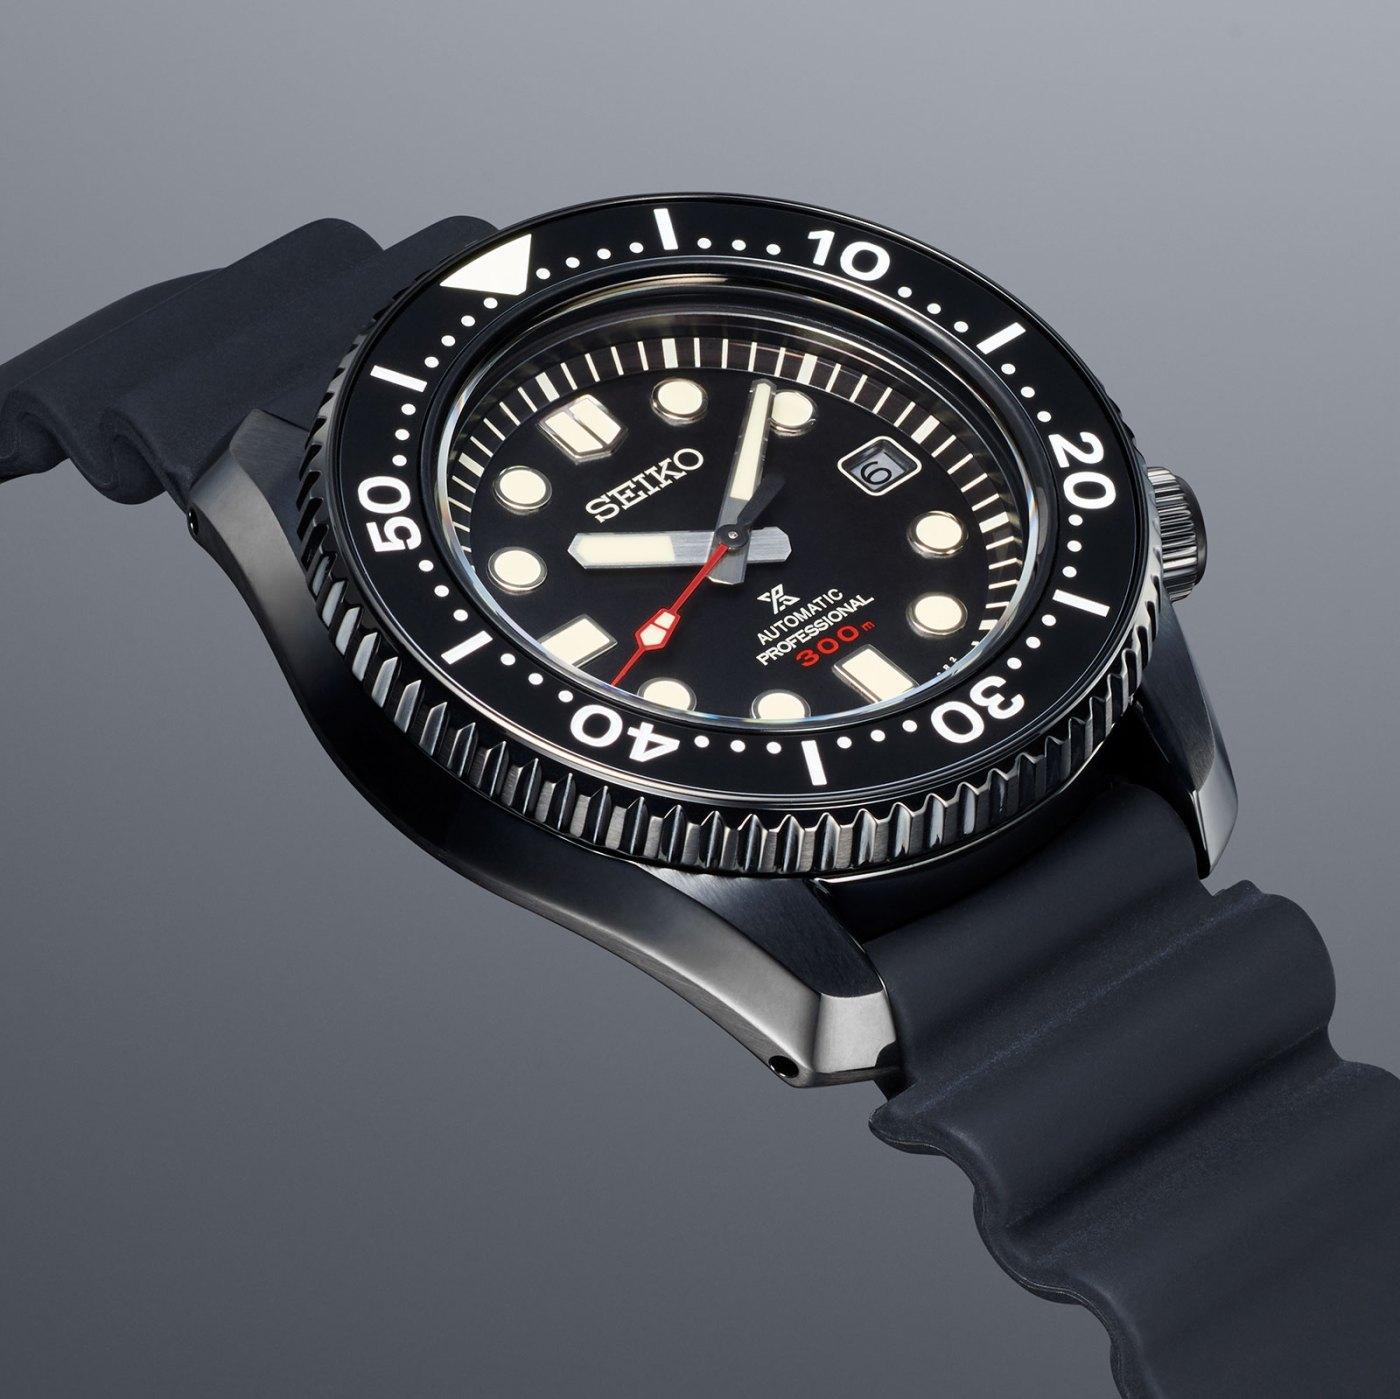 2020 Seiko Prospex Black Series Divers